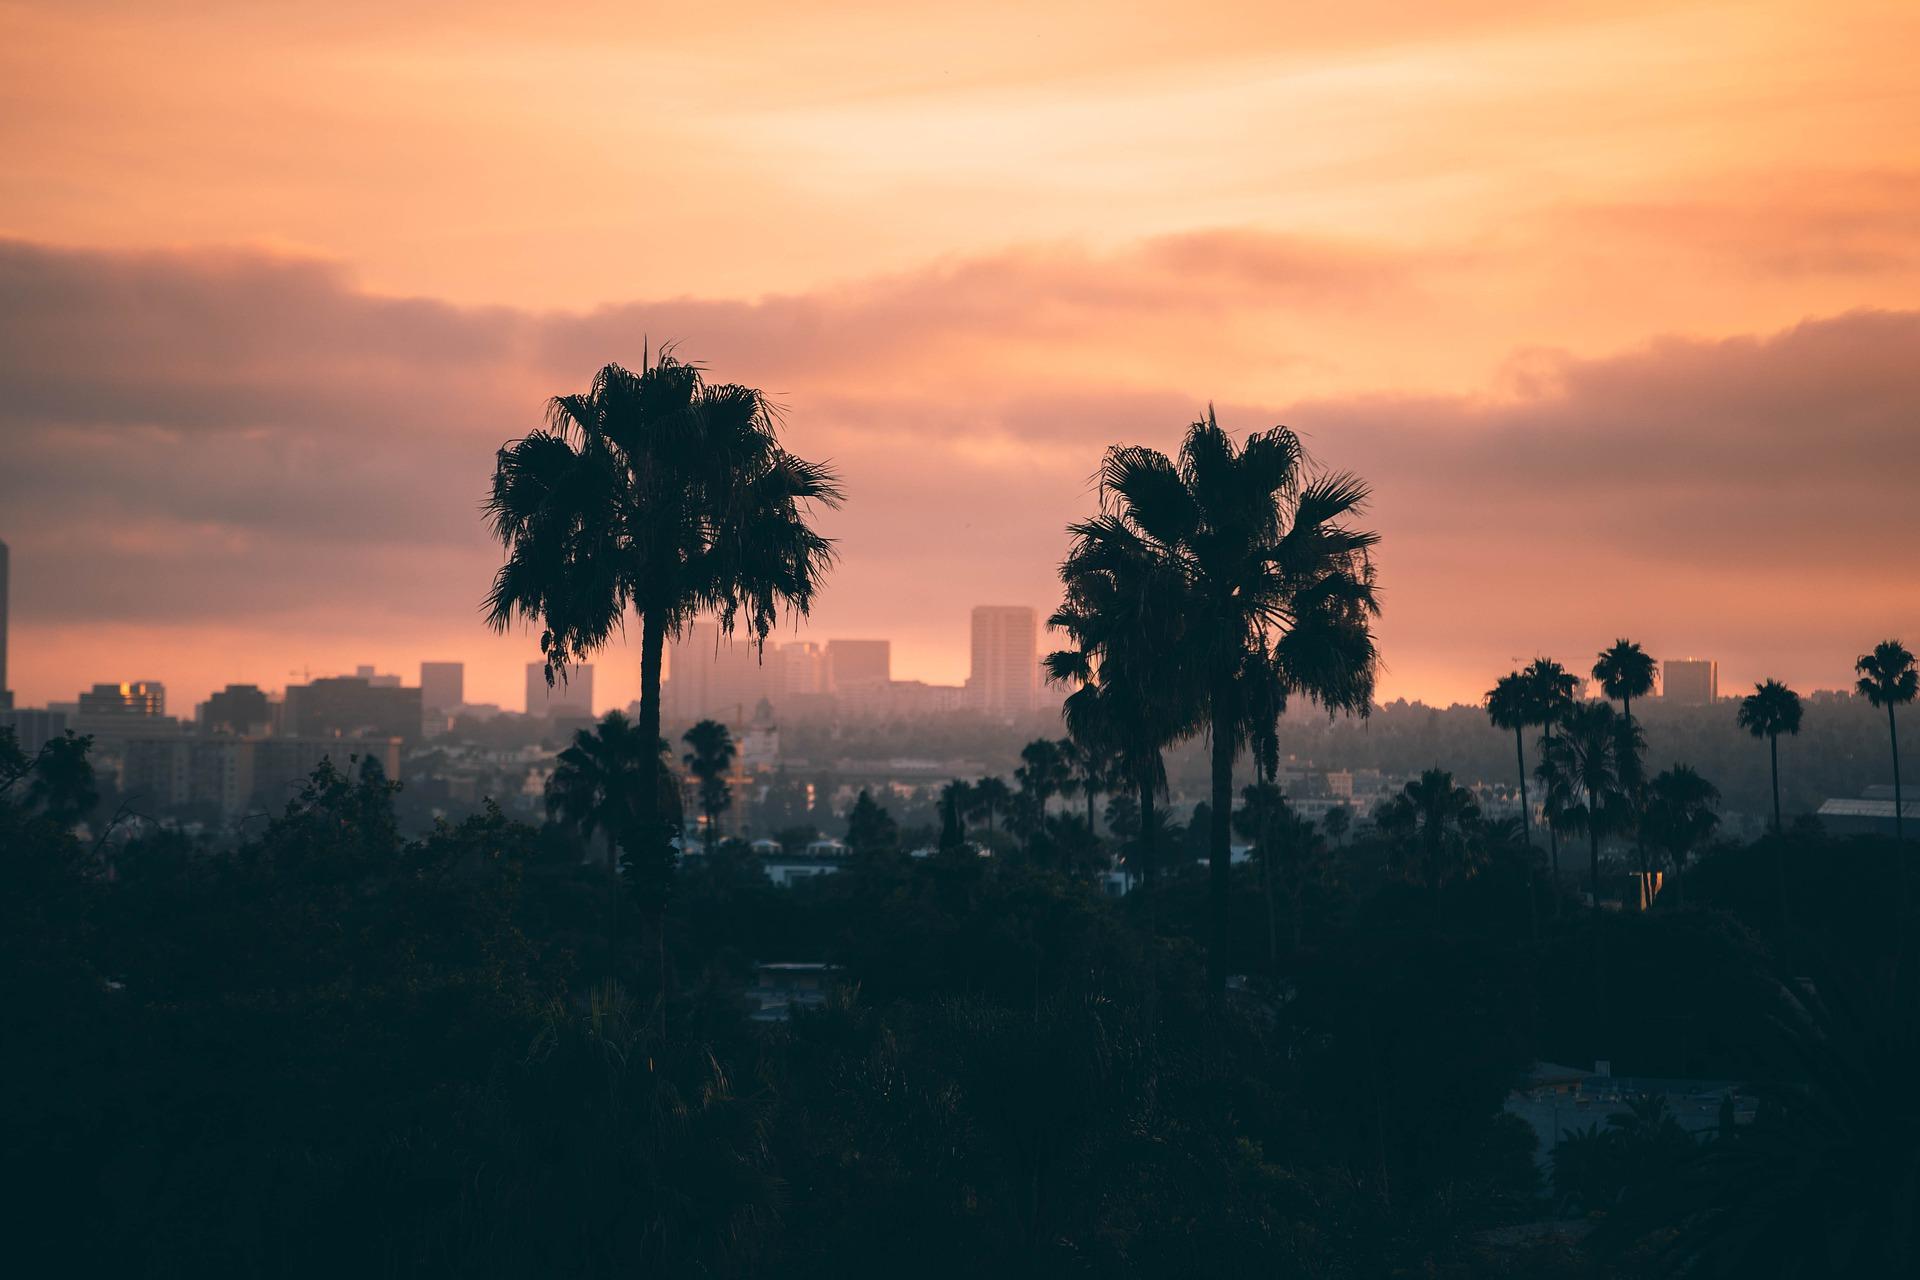 Los Angeles im Sonnenuntergang, prominent zu sehen zwei grosse Bäume.